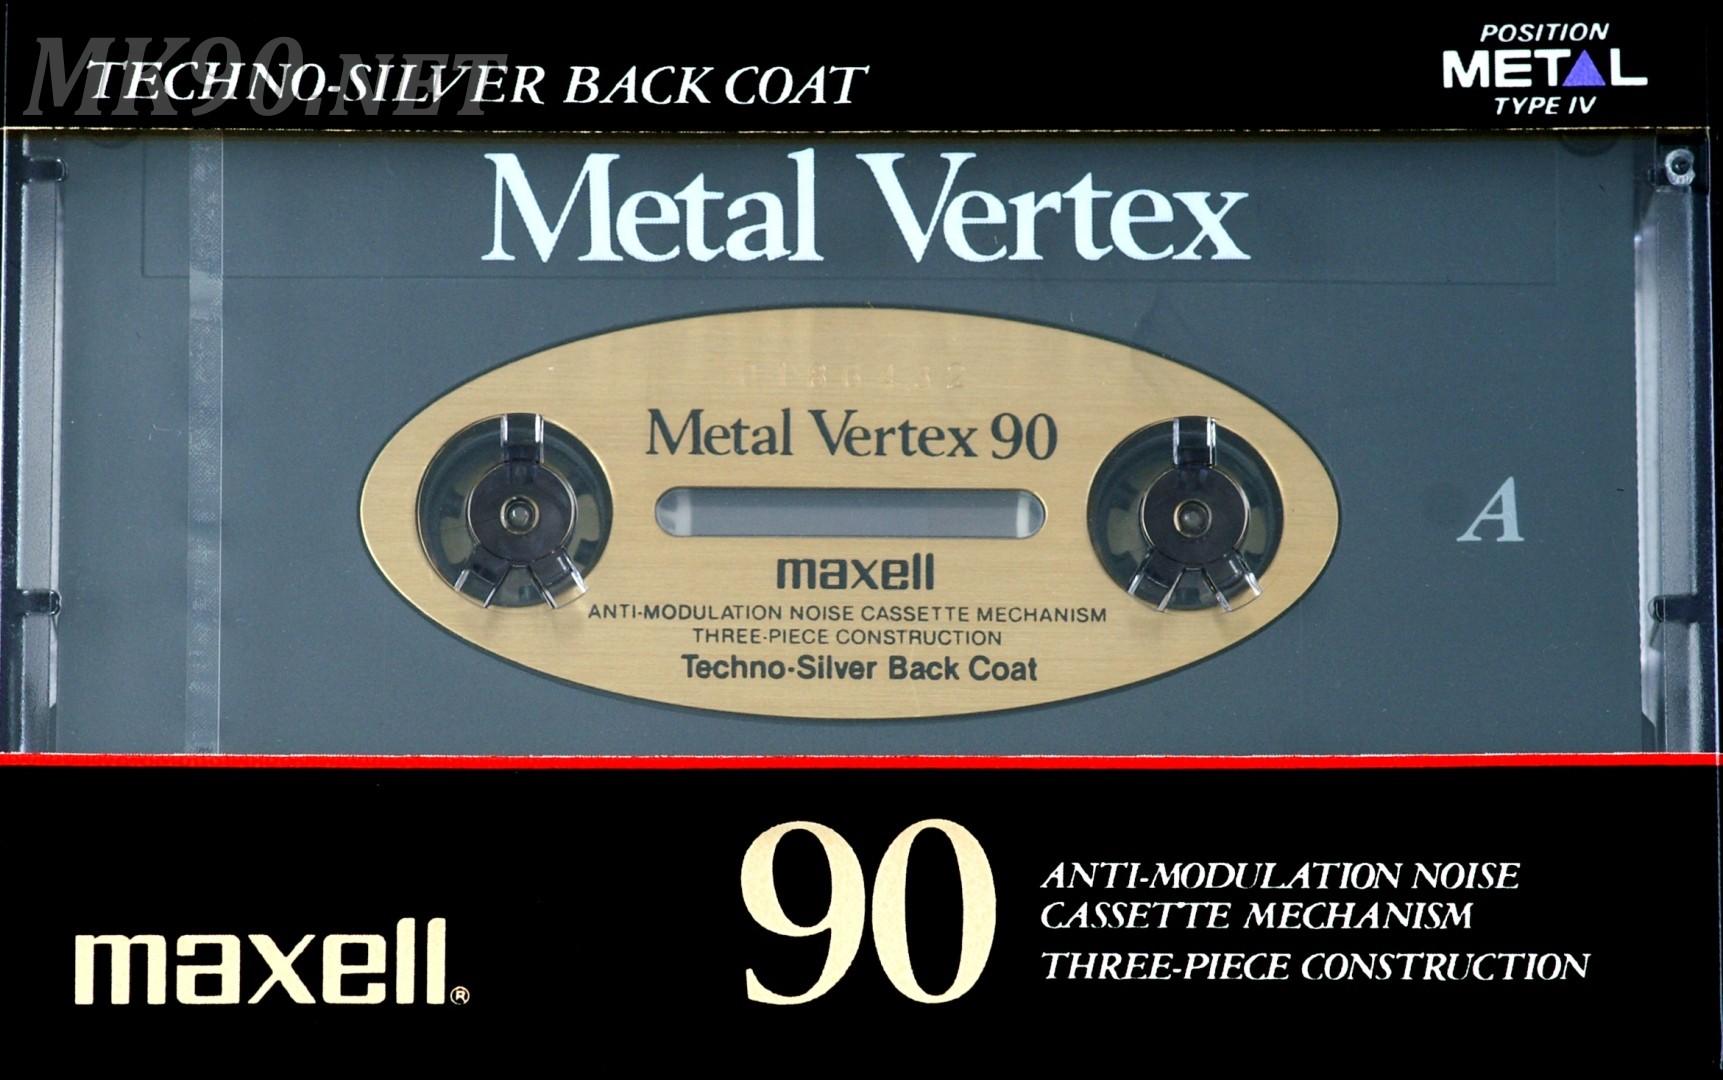 Maxell Metal Vertex 90 1989-90 001